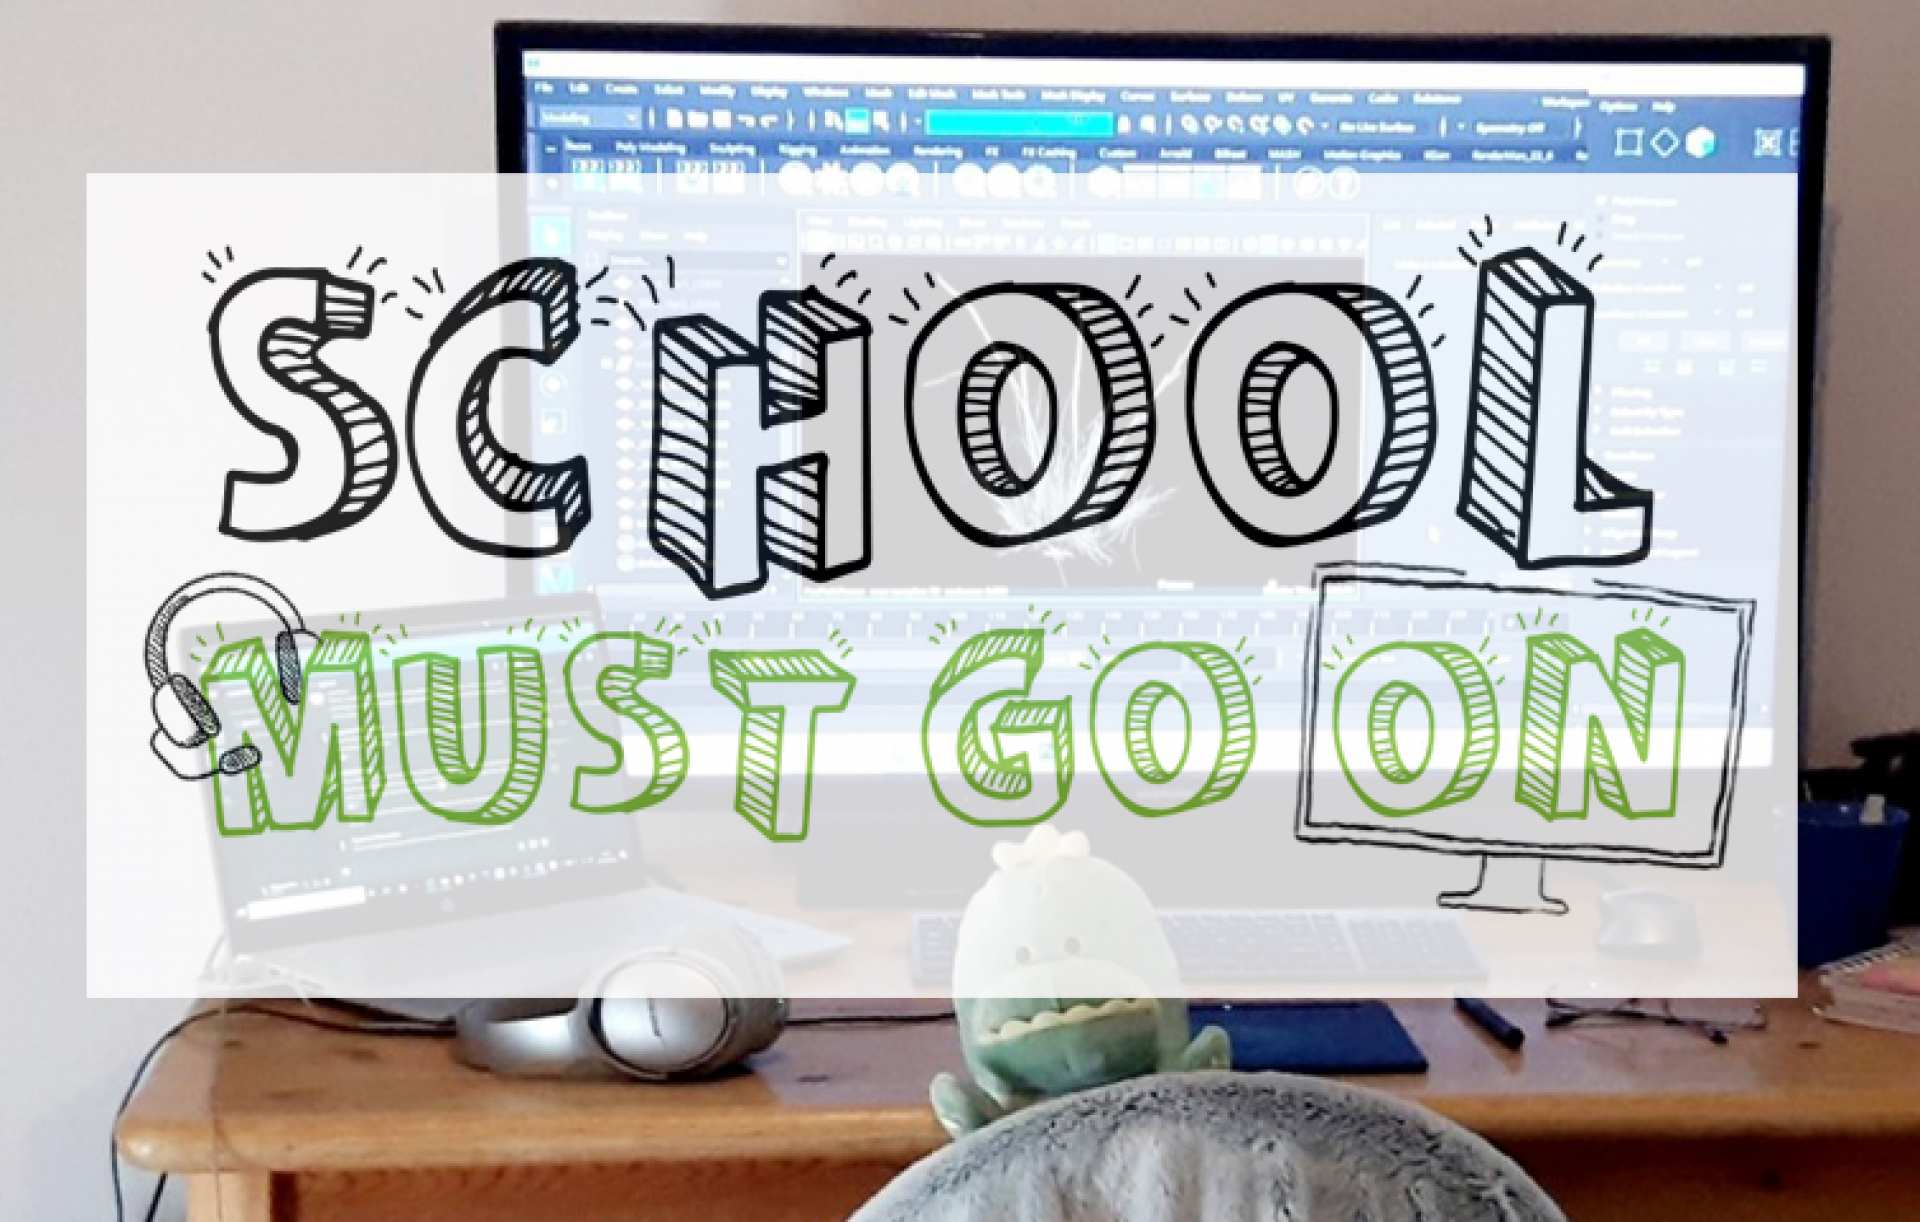 school-must-go-on-.jpg